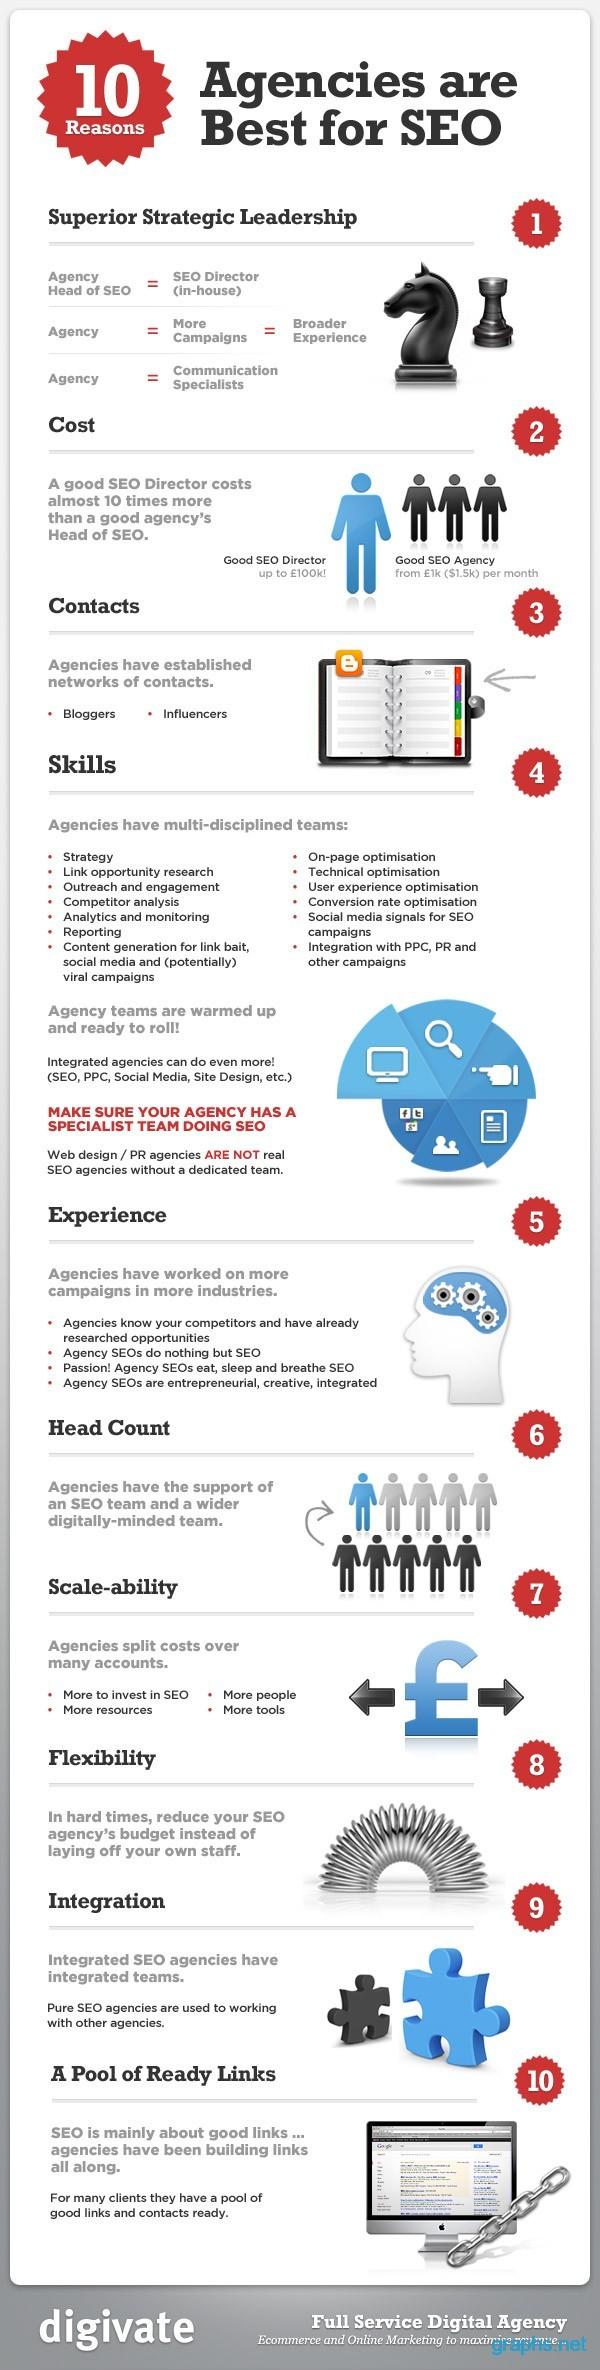 best seo agencies tips